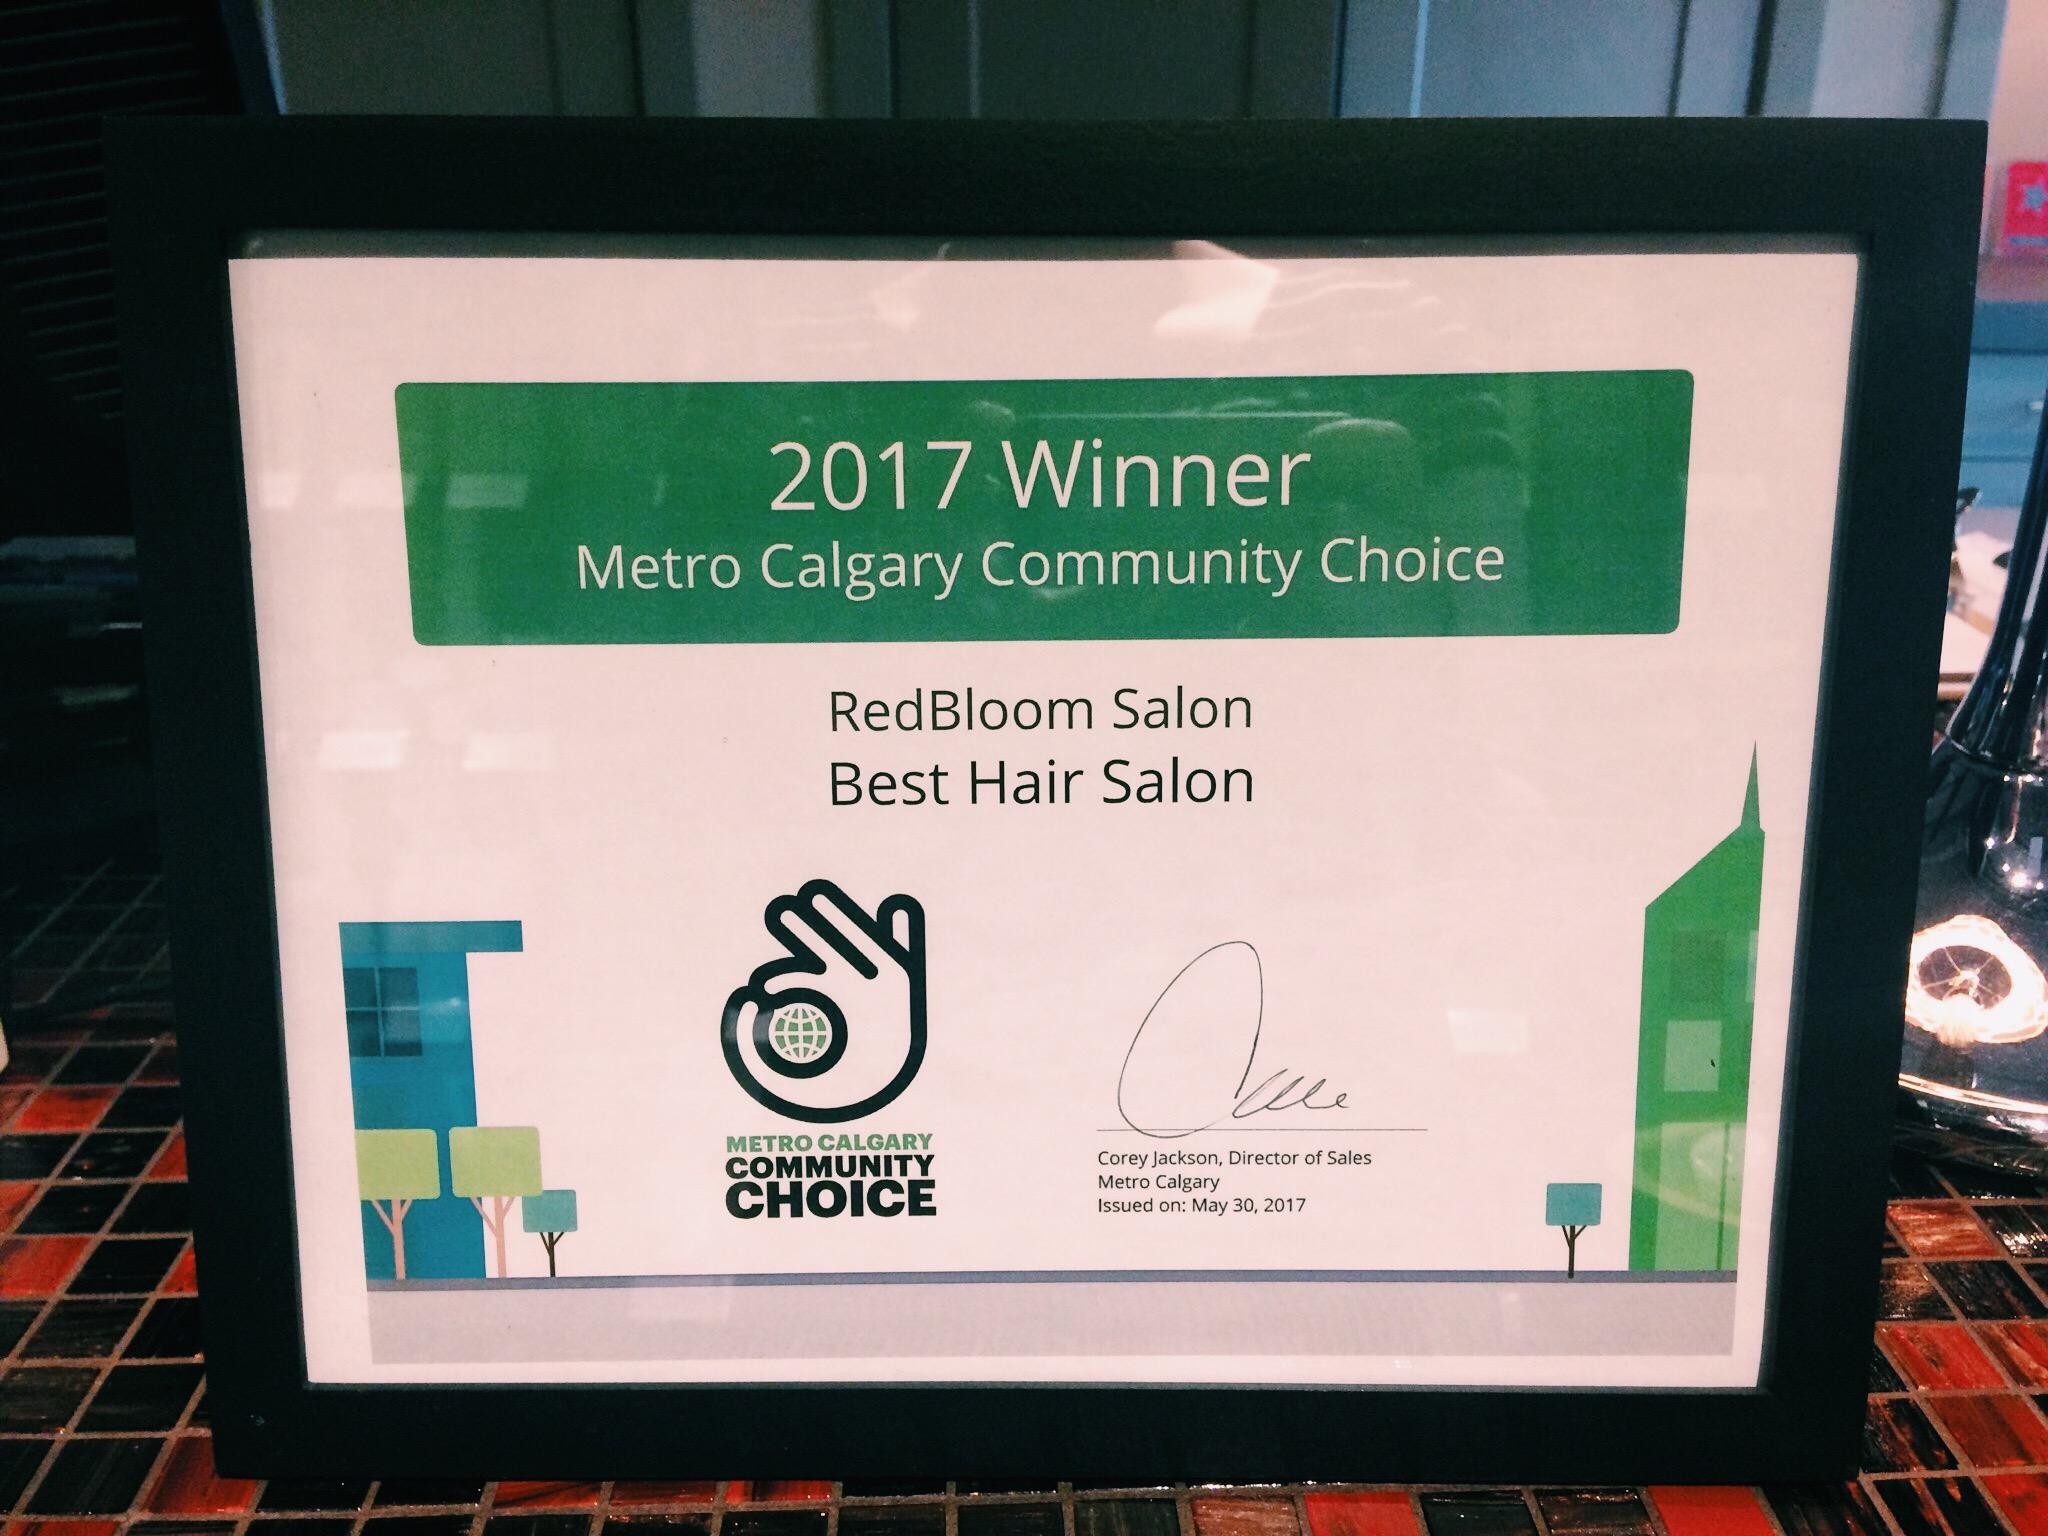 Best Hair Salon Metro Calgary Community Choice